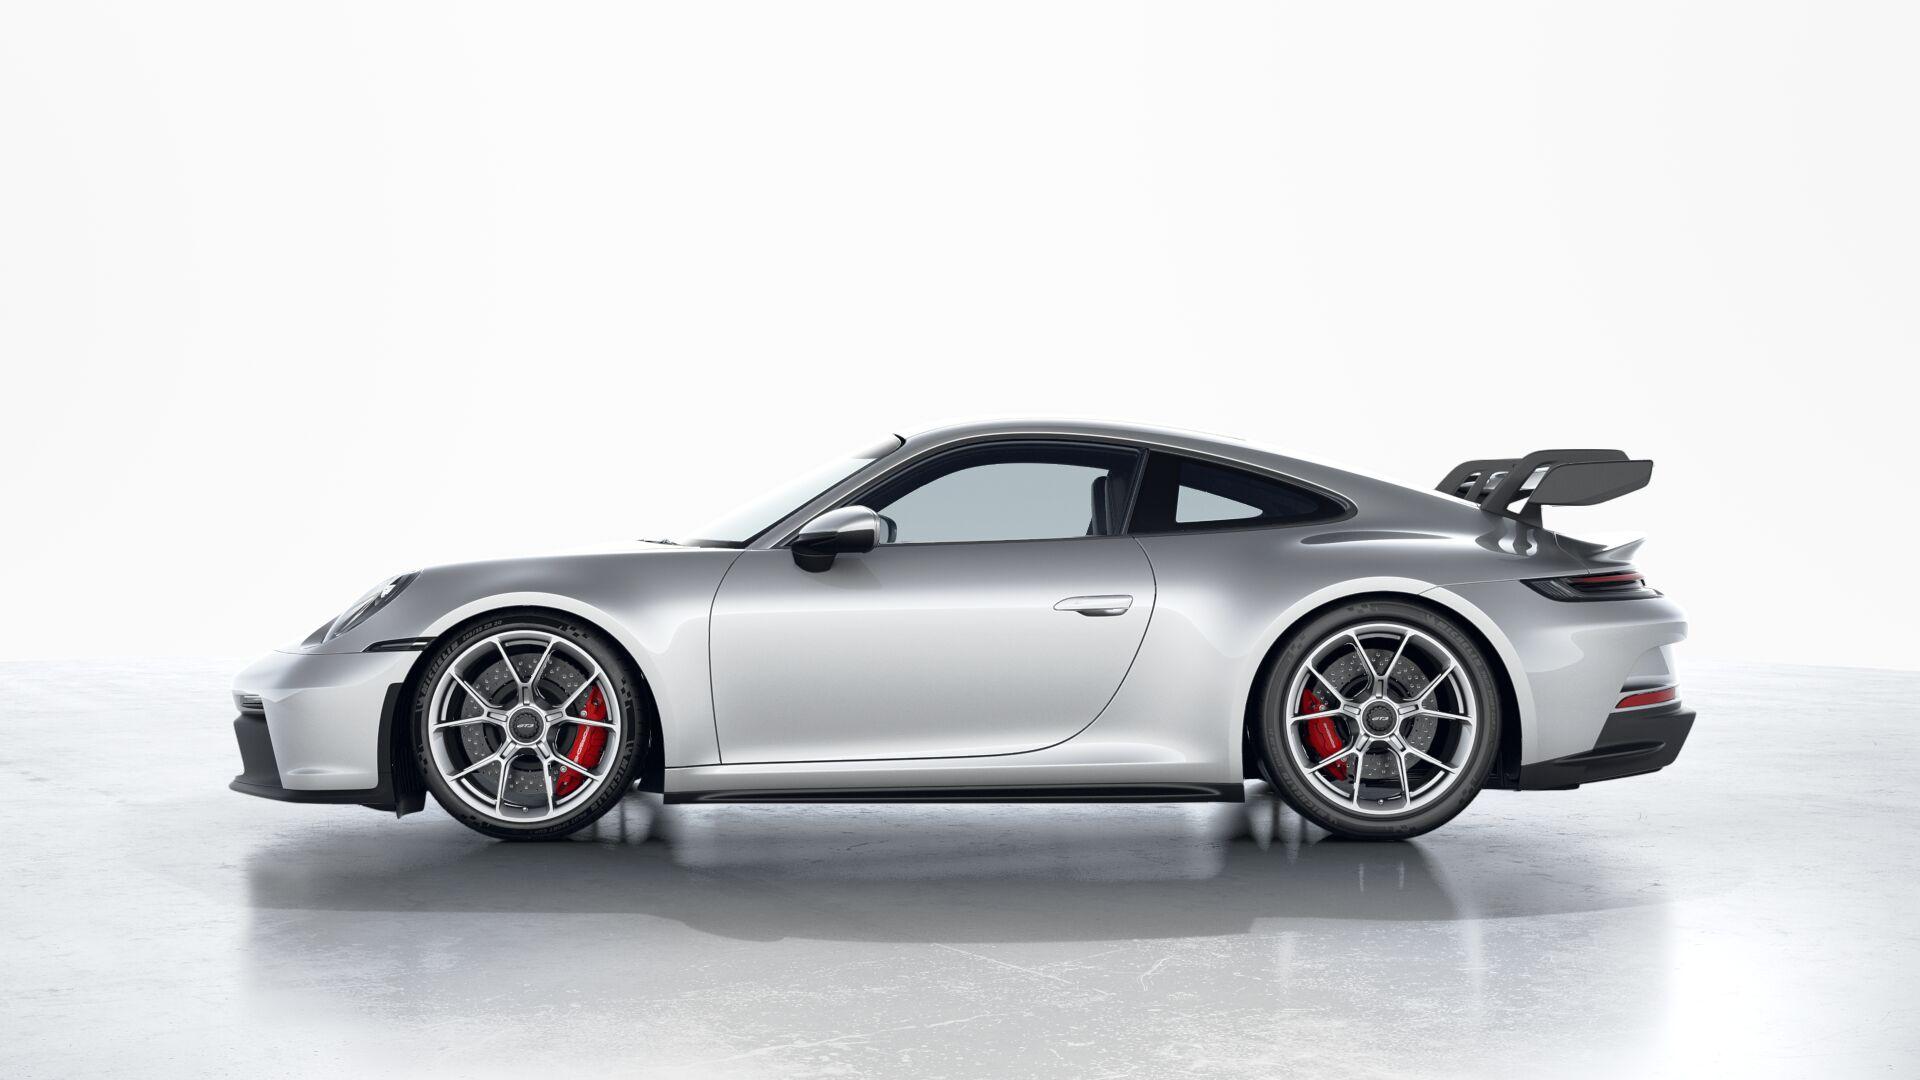 2022 Porsche 911 GT3 In Agate Grey (Metallic)